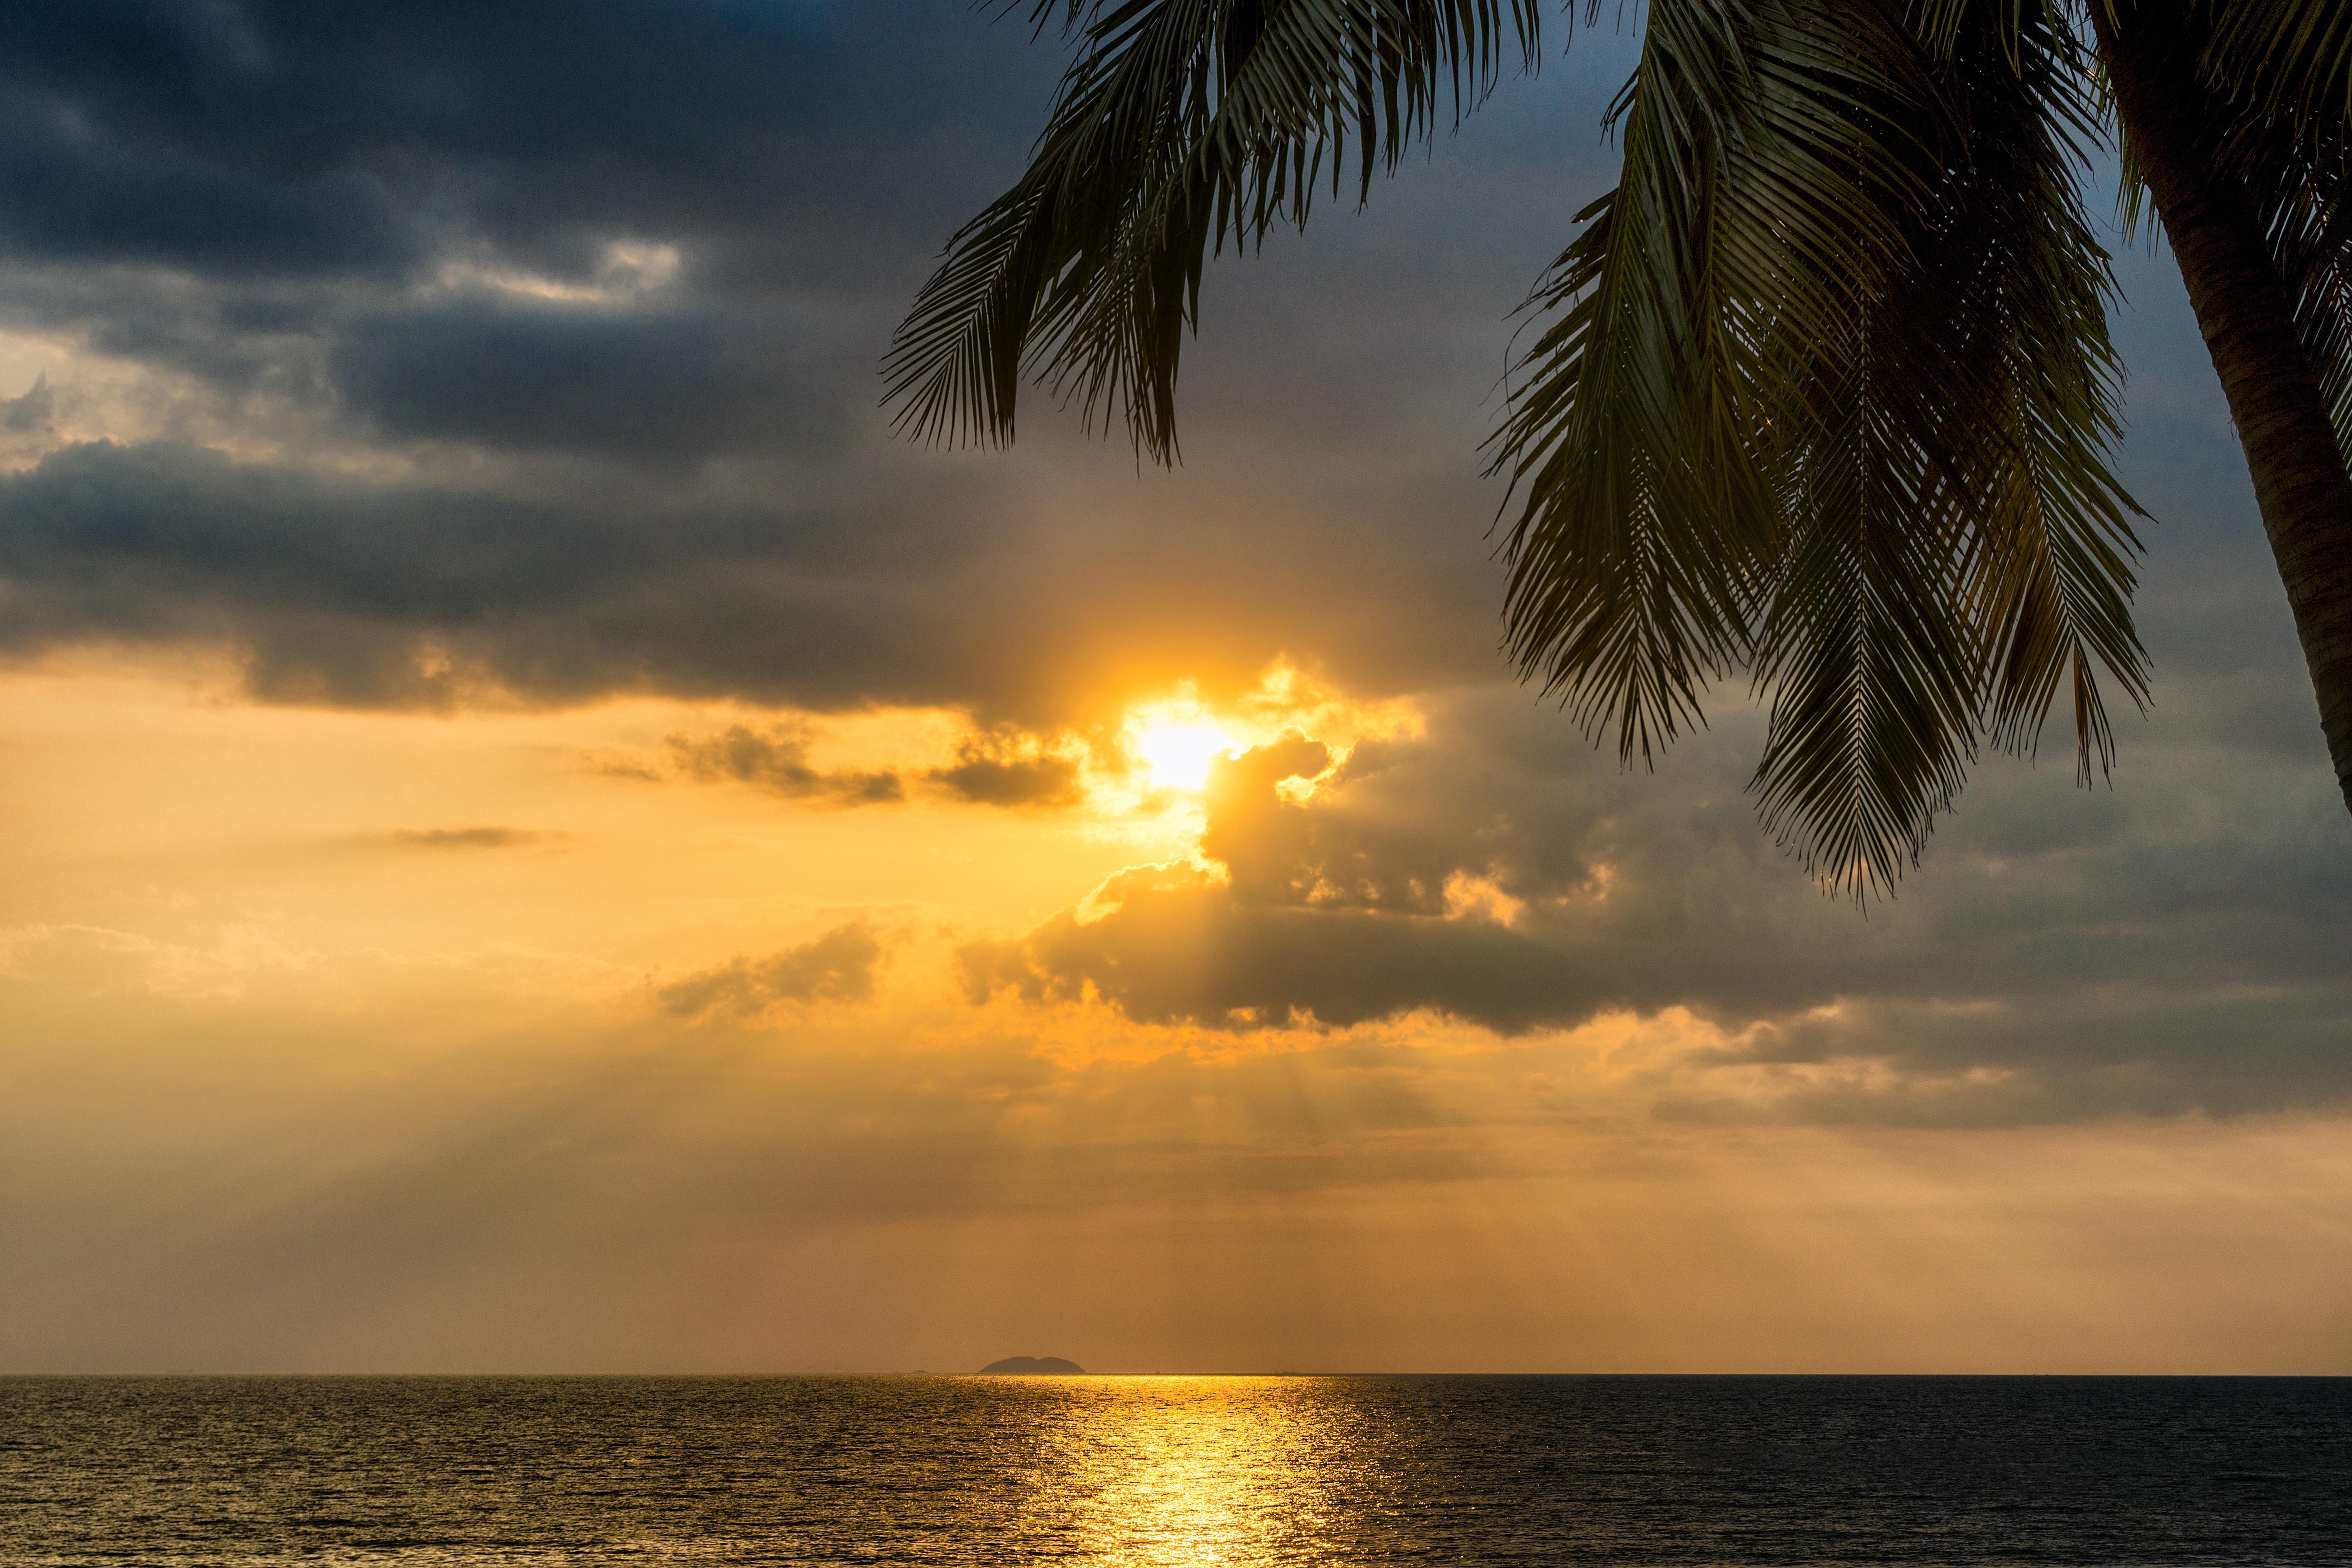 Tropics Palm Trees Sun Beach 4k Hd Desktop Wallpaper For: 3840x2160 Tropical Palm Tree Beside Sunset Ocean 5k 4k HD